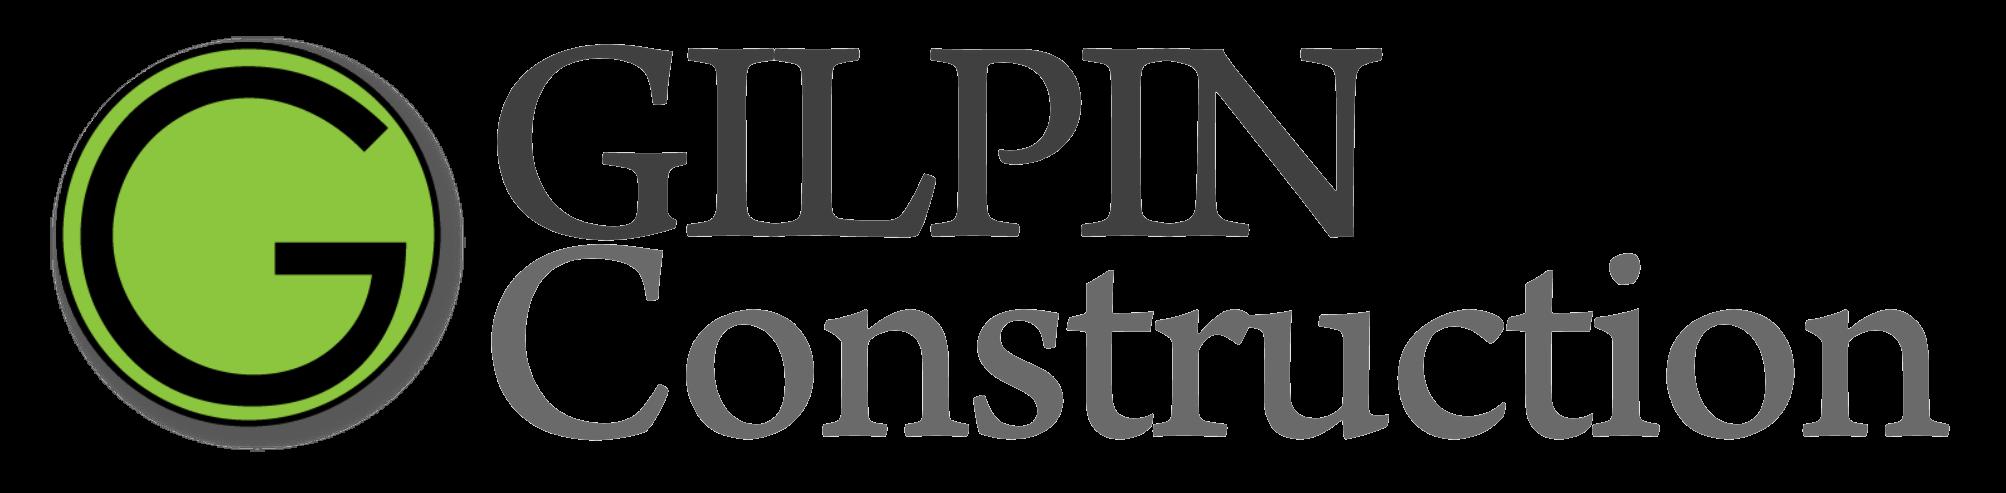 Gilpin Construction Company